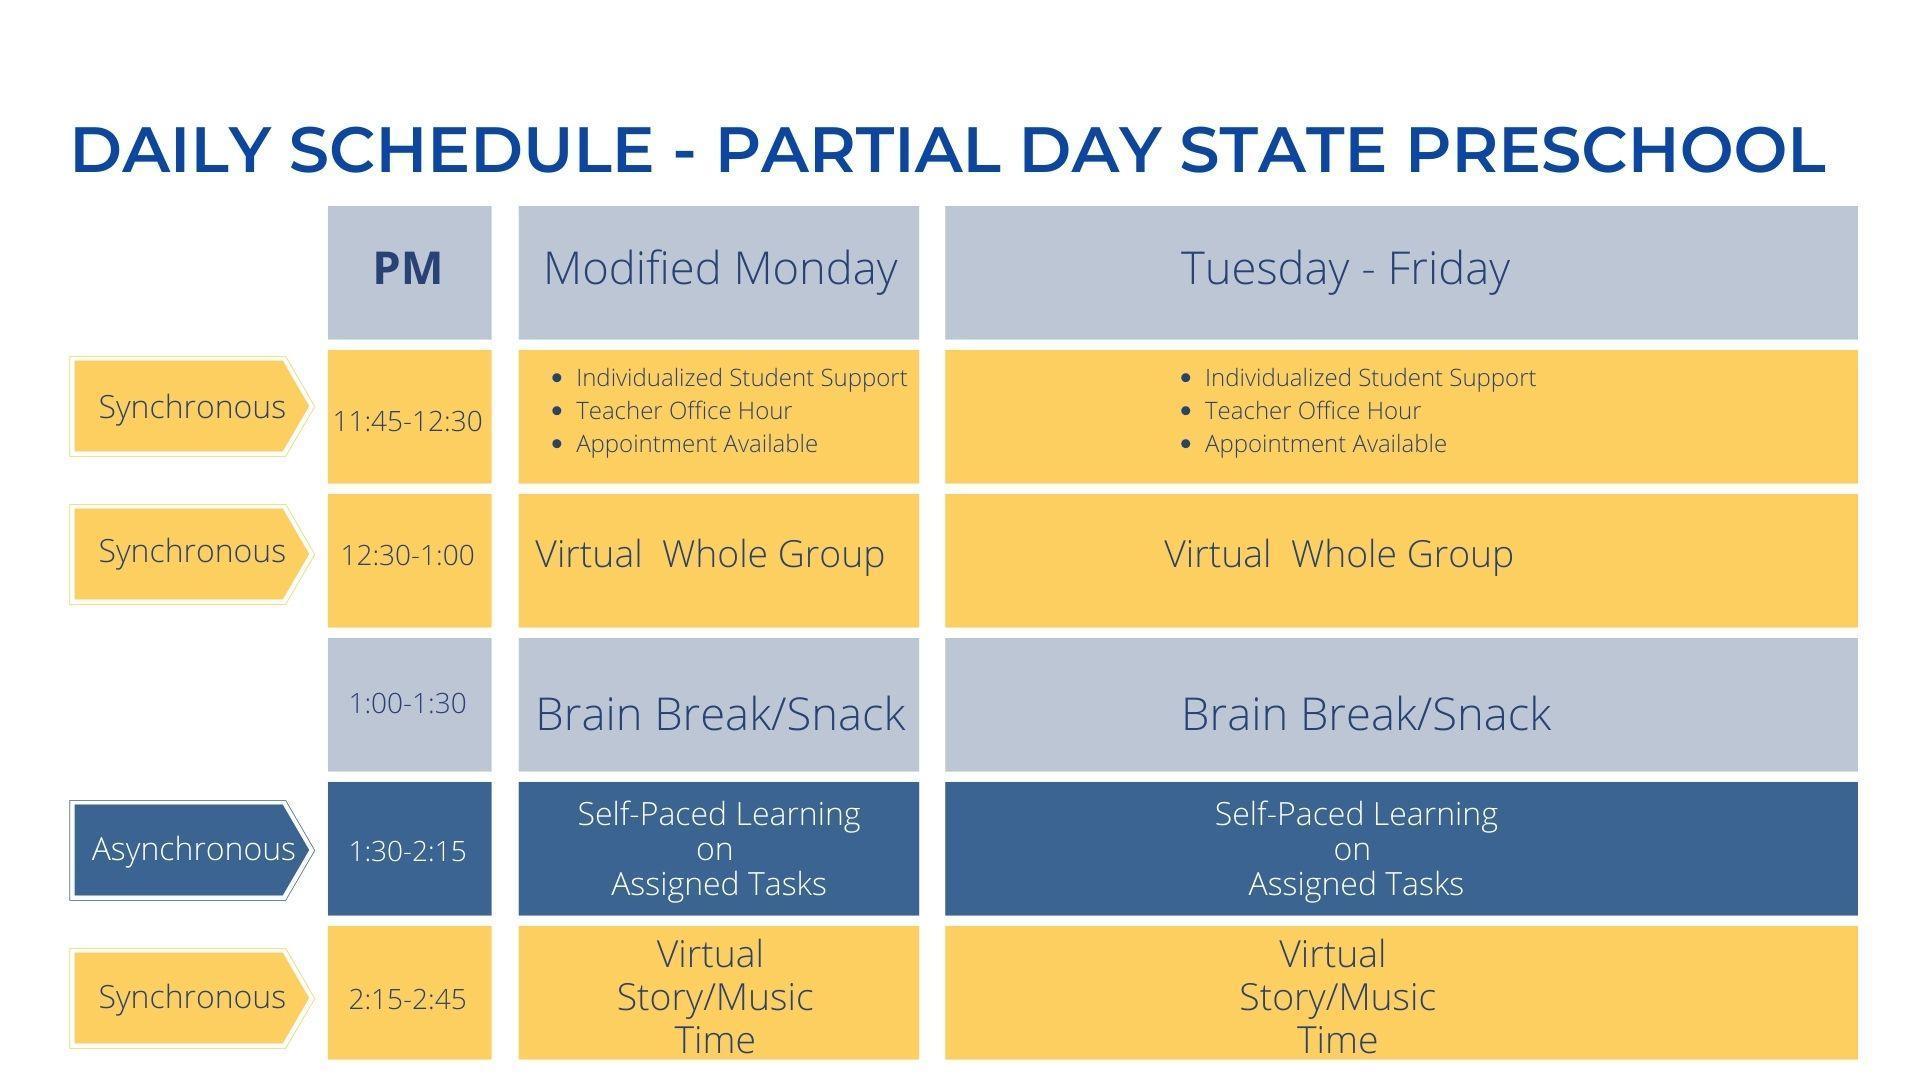 PM Partial Day State Preschool